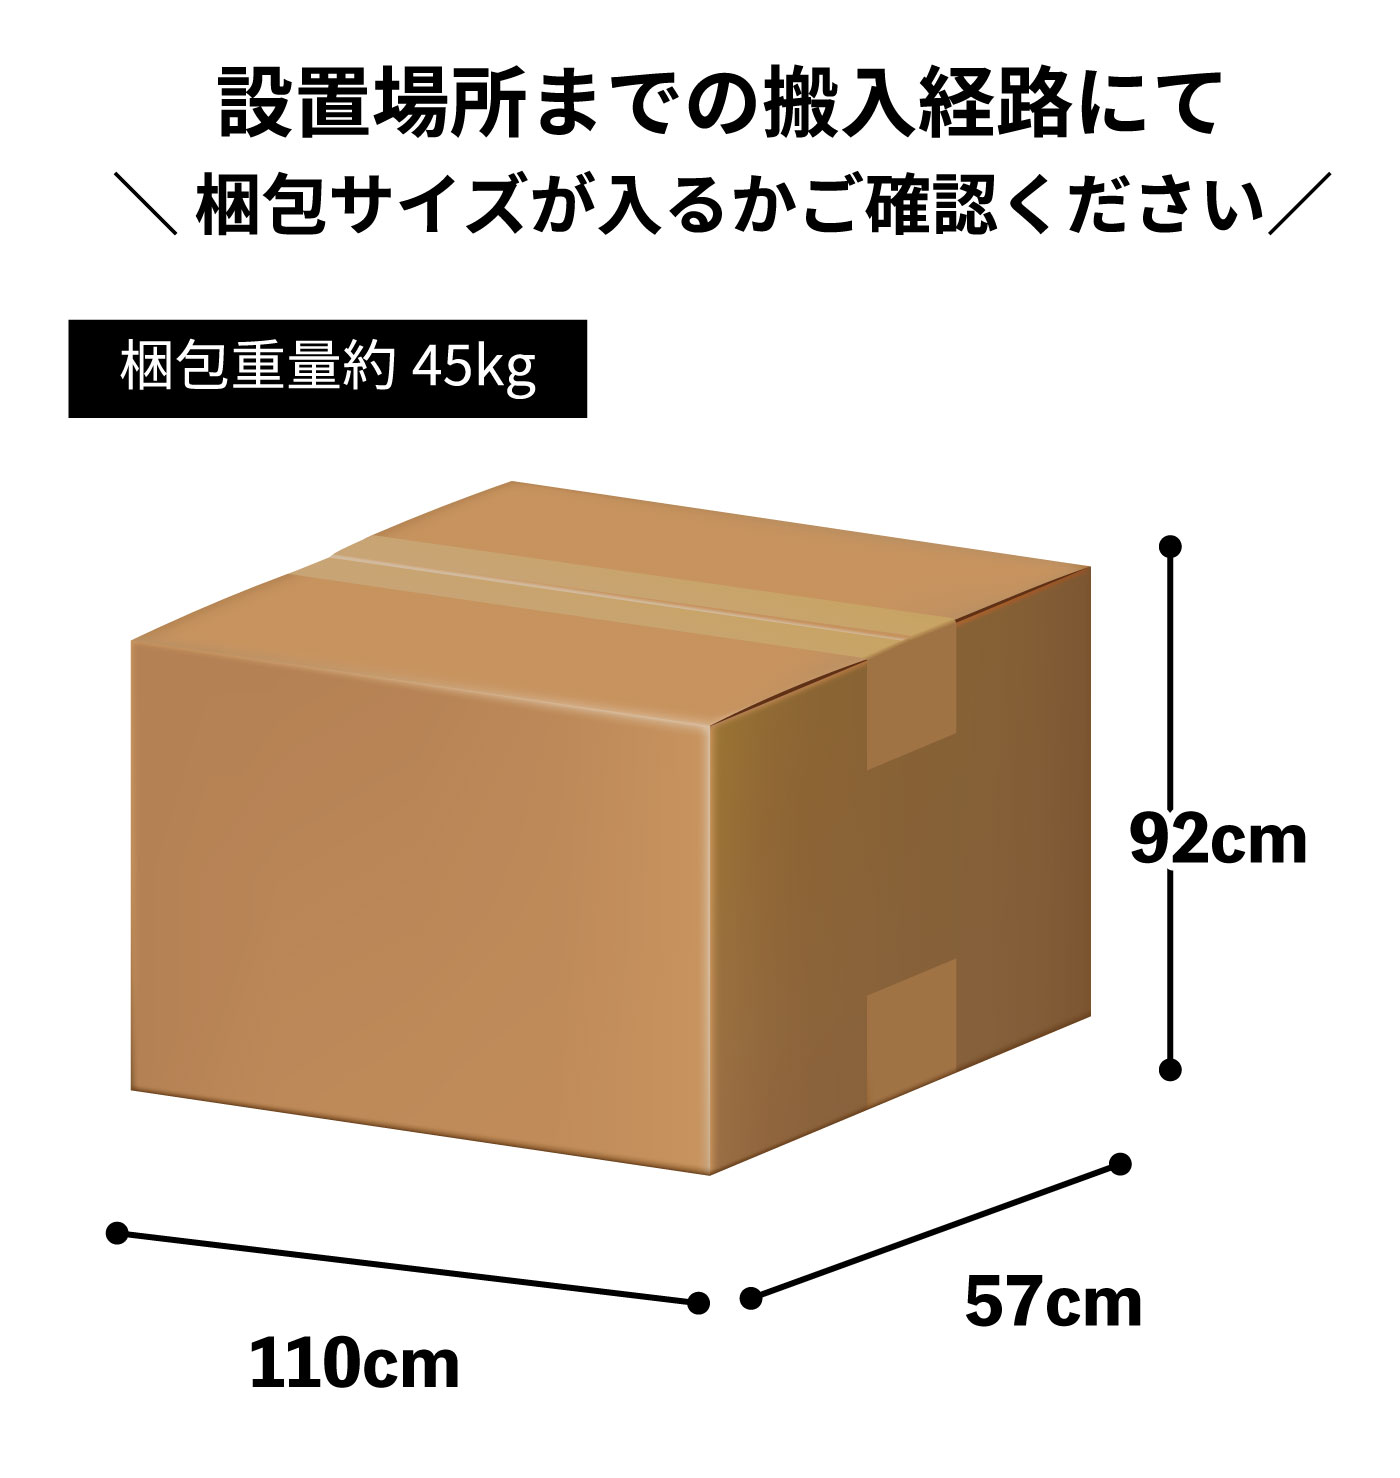 DK-8702Pの梱包サイズ